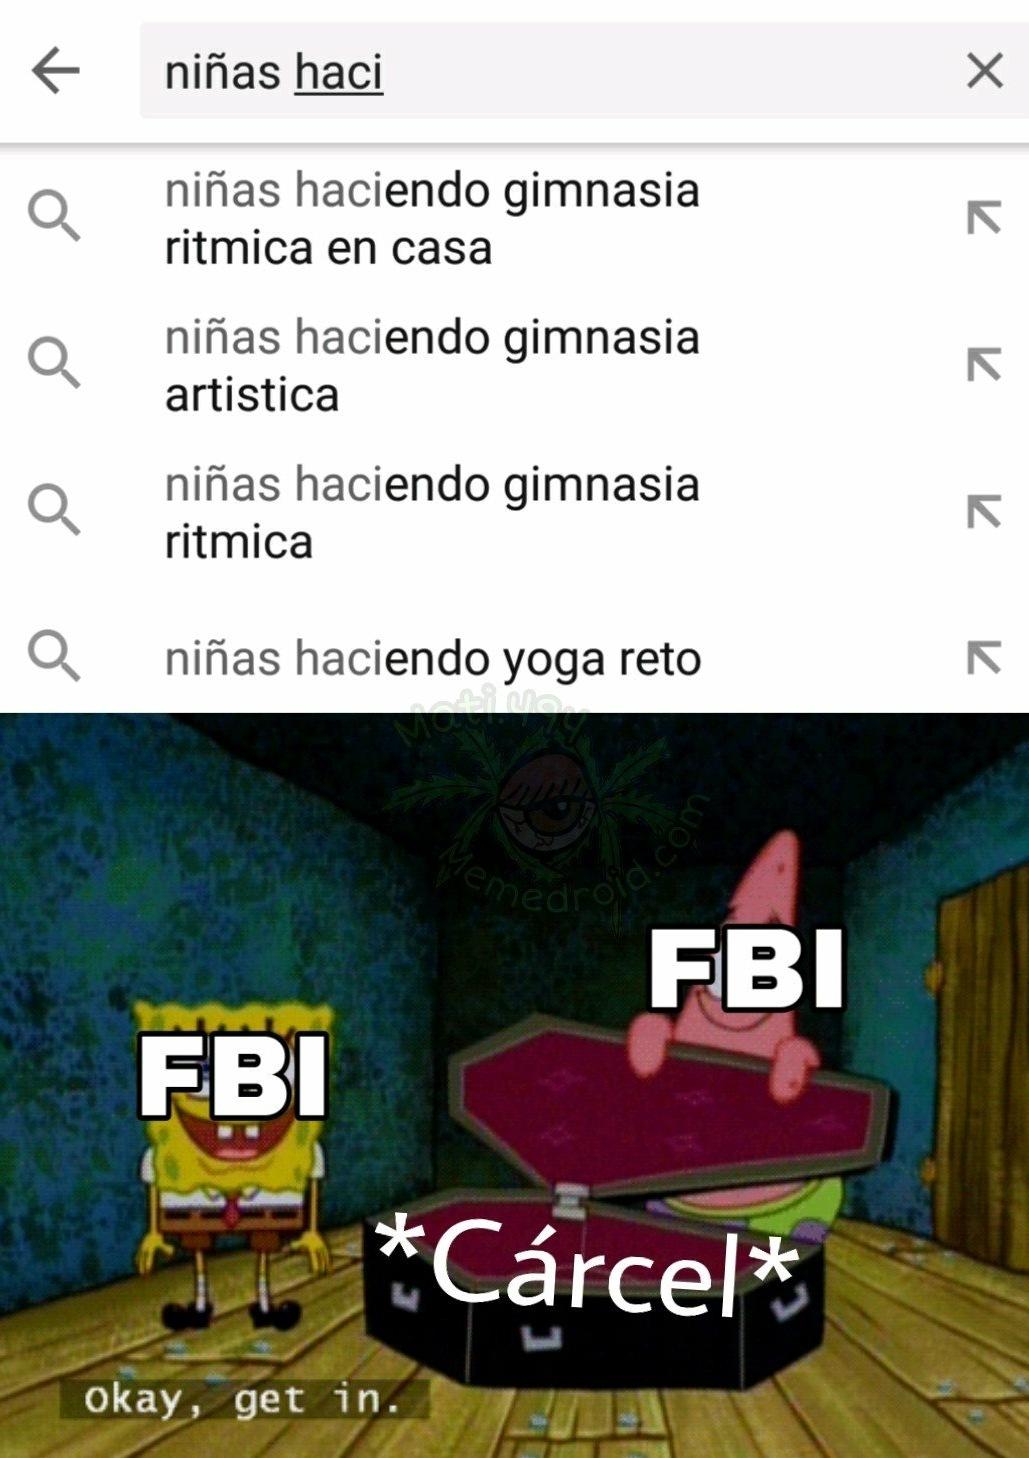 Adentro pibe - meme